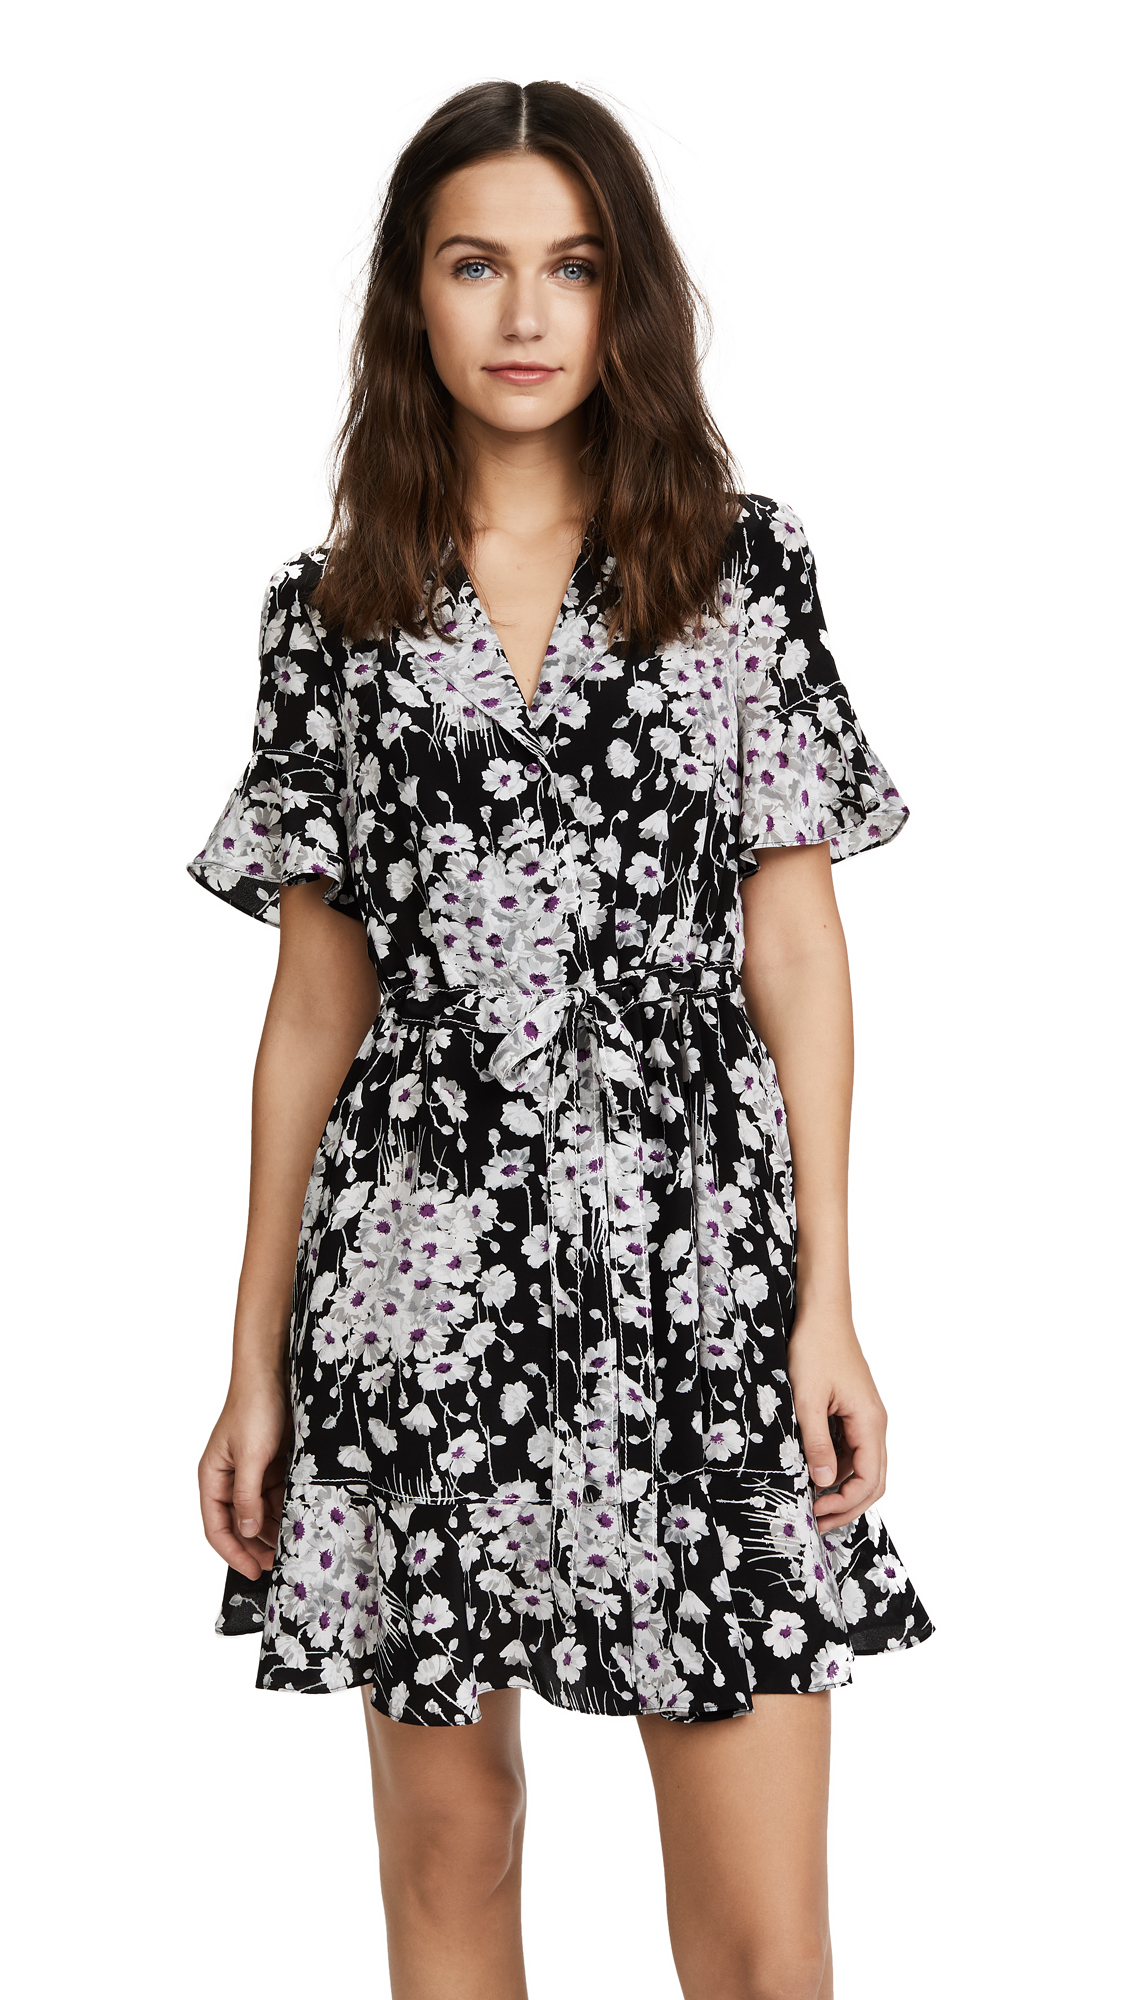 Cinq a Sept Arabella Dress - Black Multi